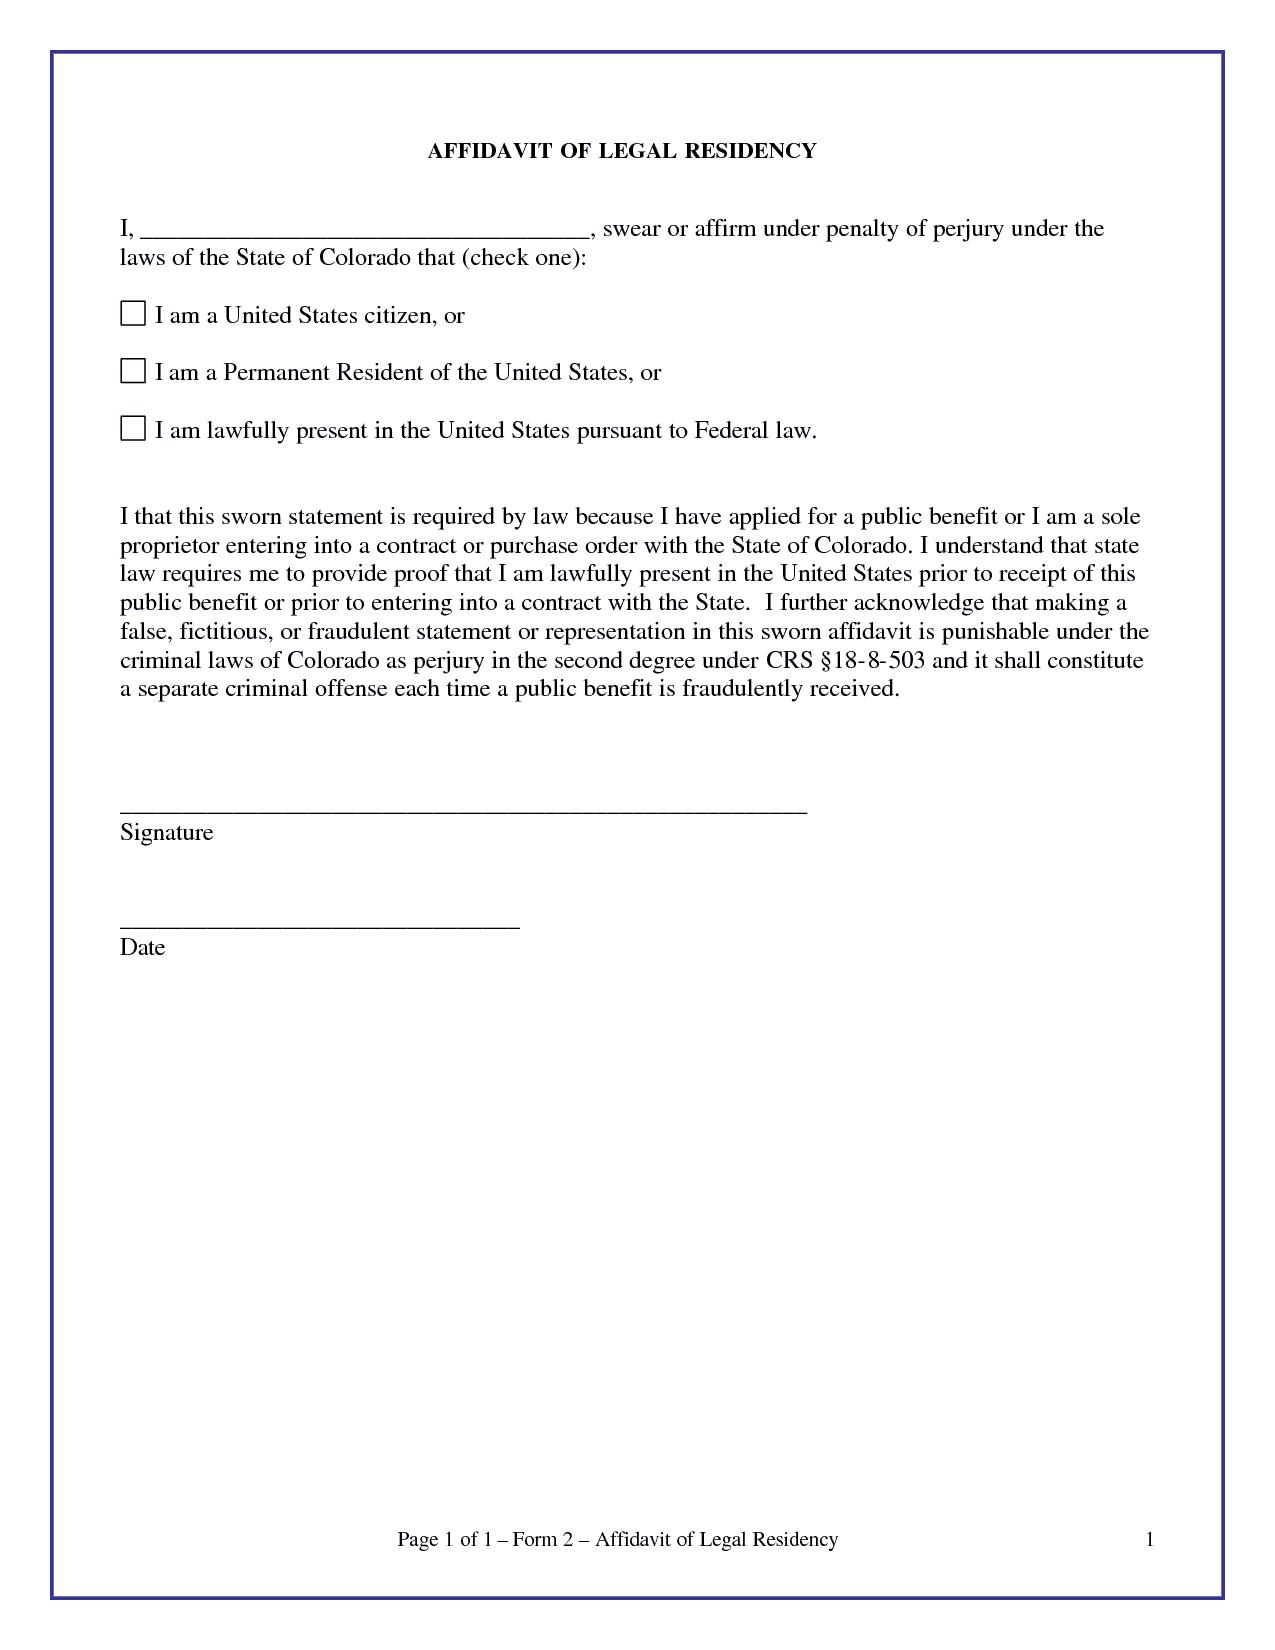 affidavit form example 5974